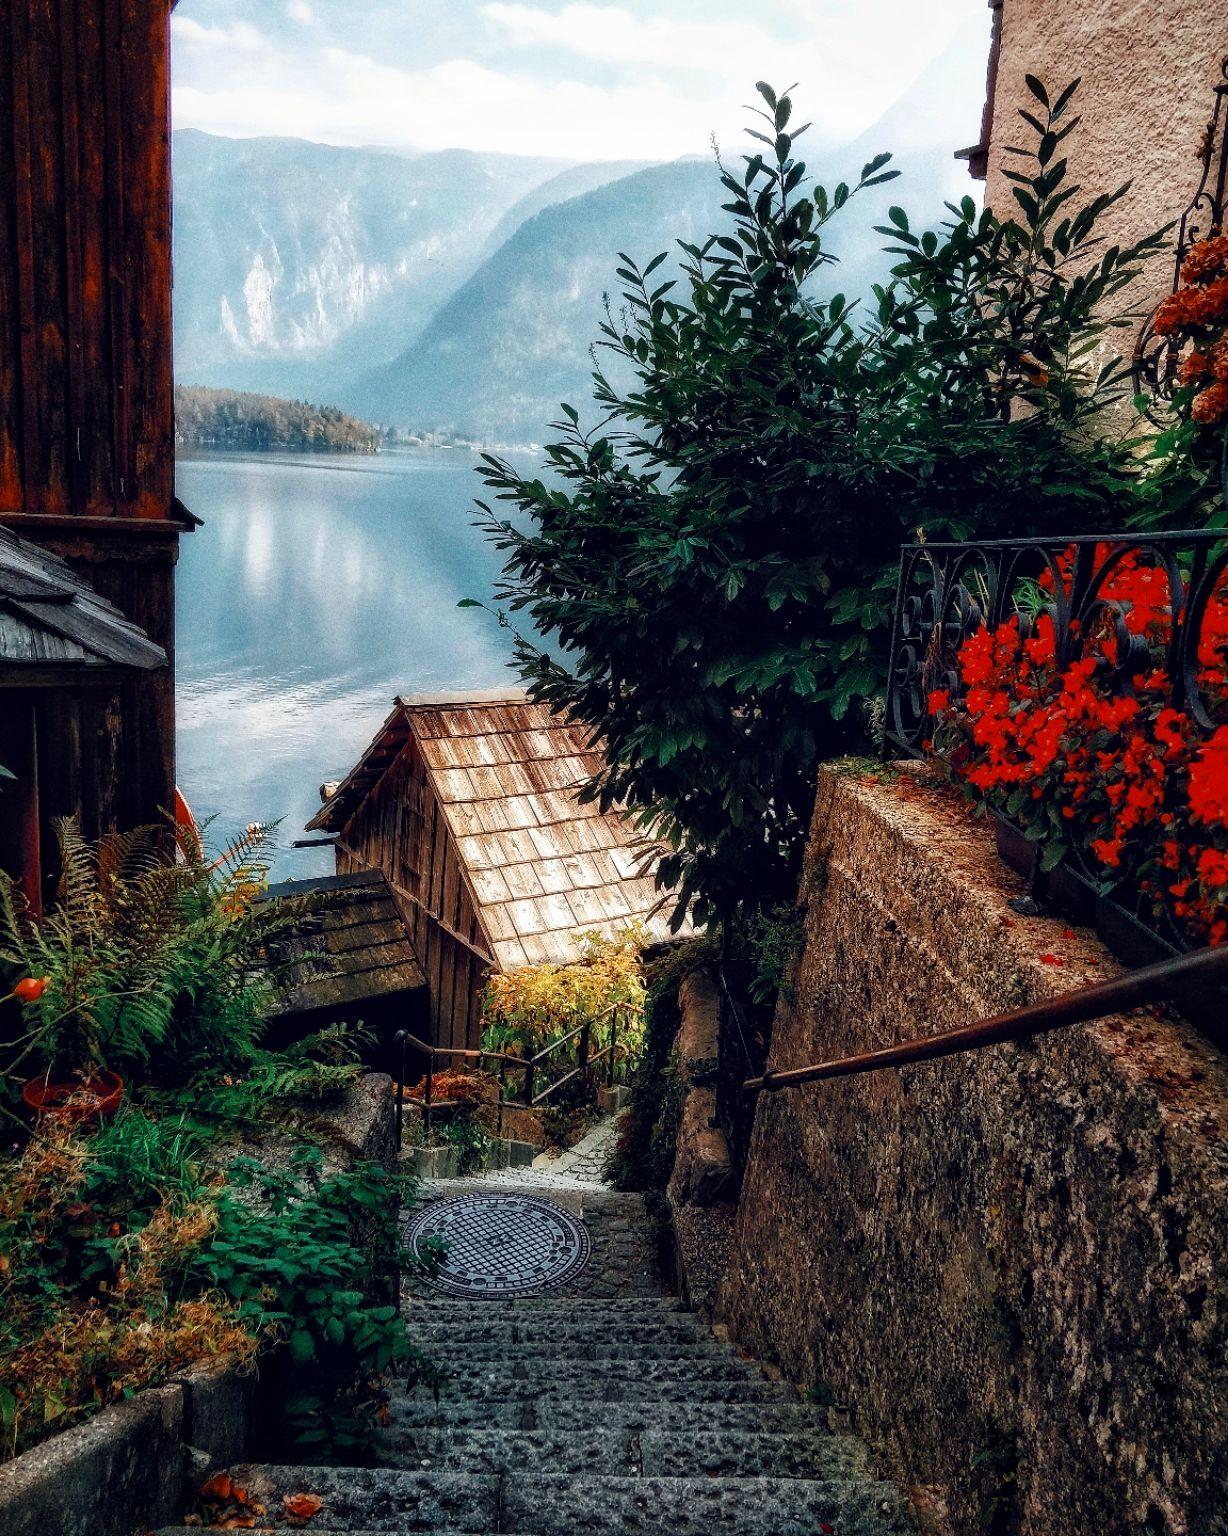 Photo of Europe By Aniket Balekar